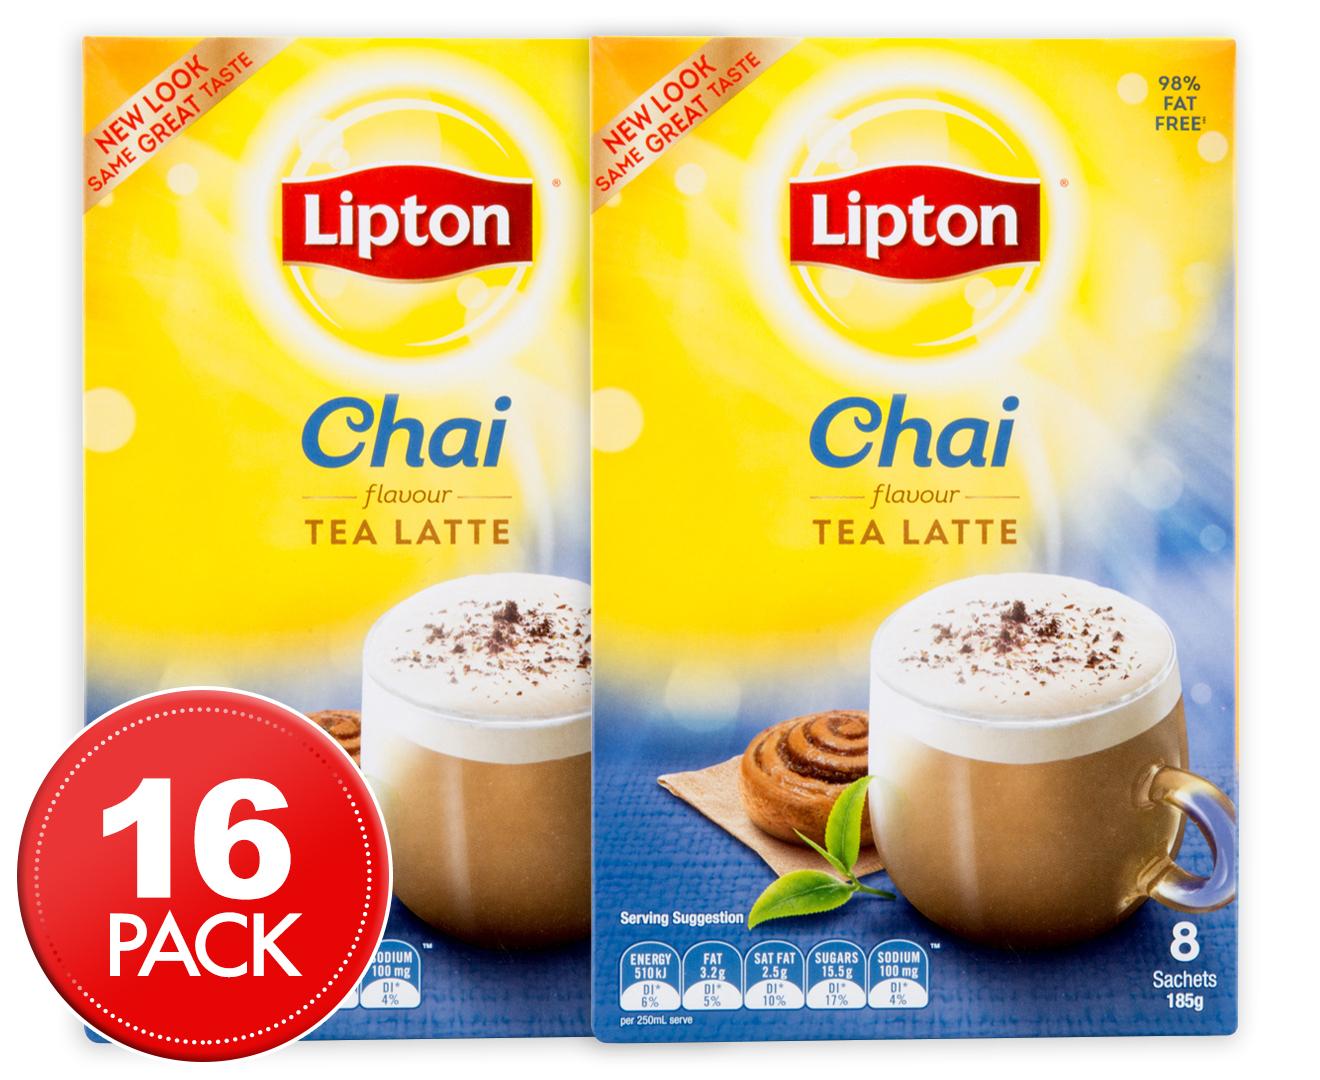 2 x lipton chai tea latte 185g 8pk. Black Bedroom Furniture Sets. Home Design Ideas